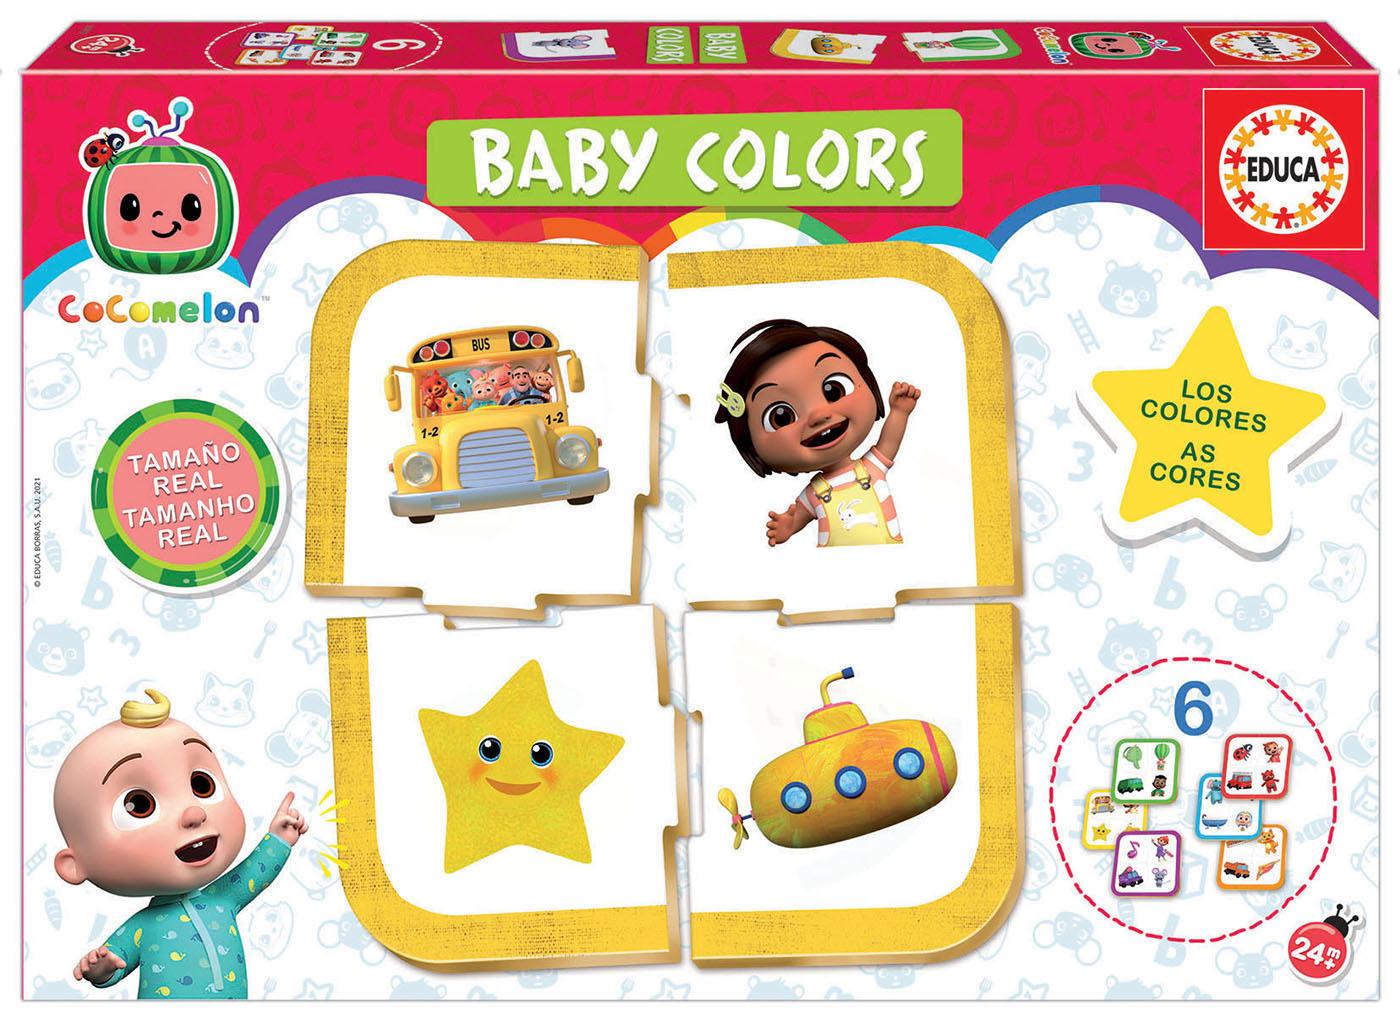 Baby Colors Cocomelon